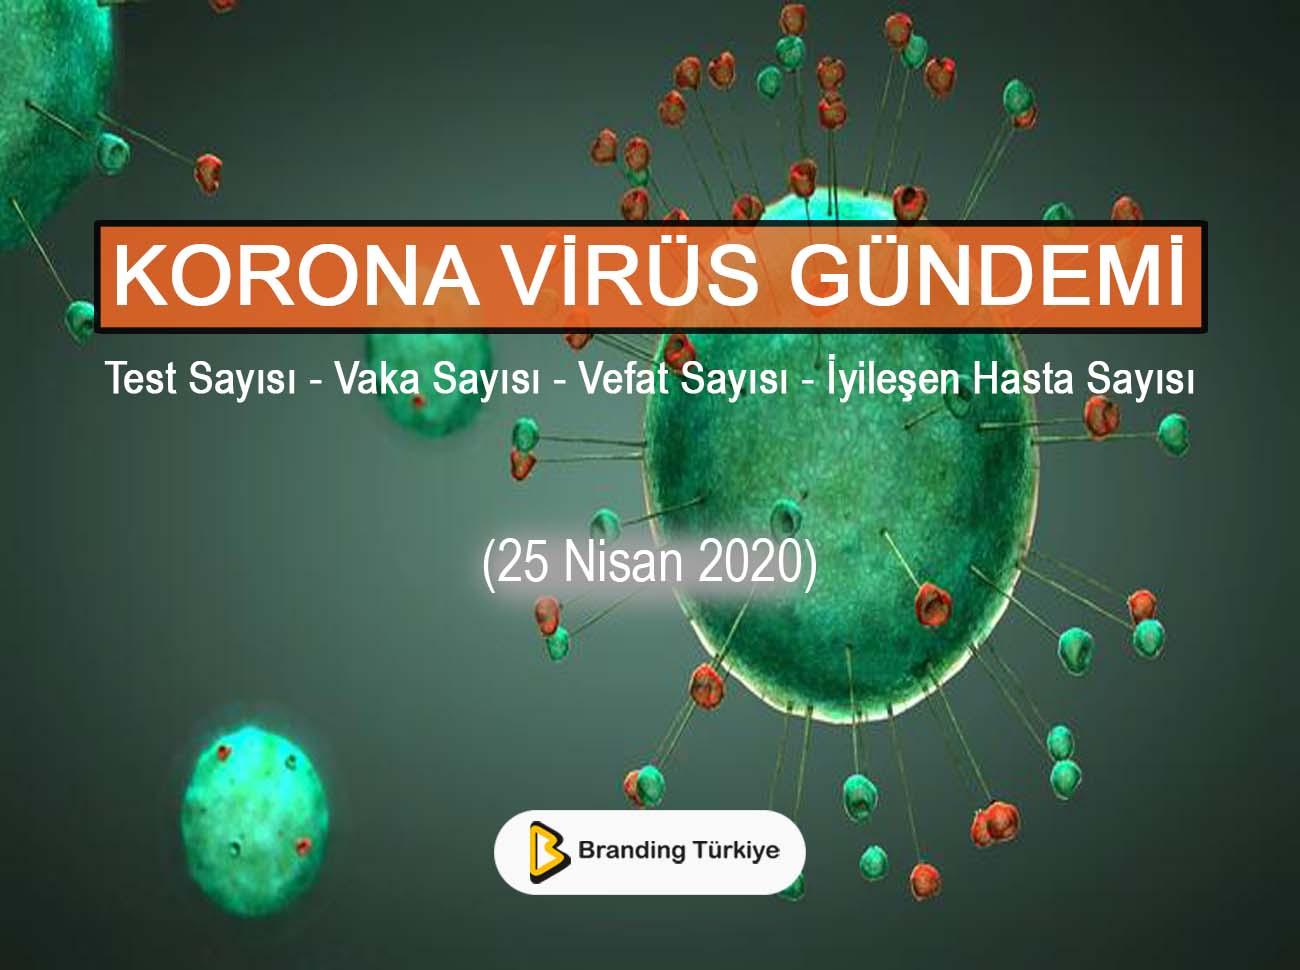 Korona Virüs Gündemi (25 Nisan 2020)